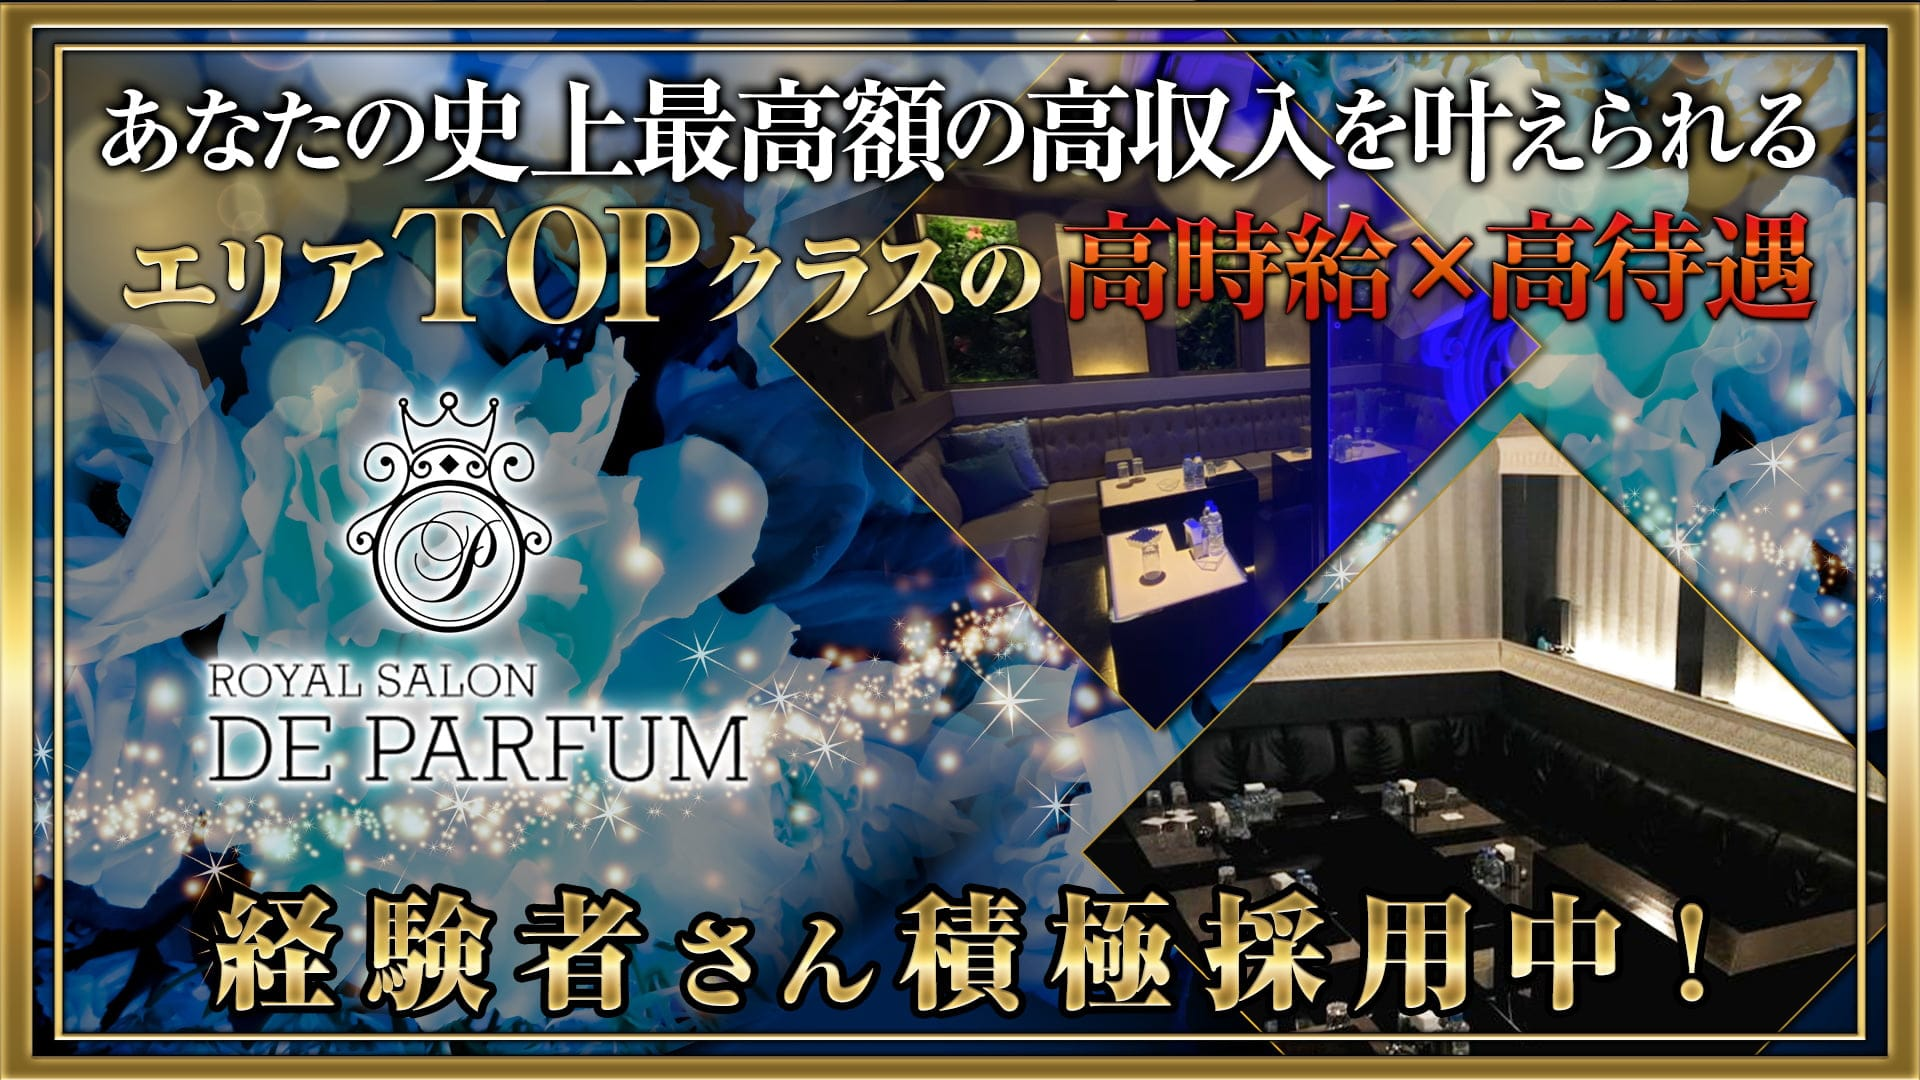 Royal Salon De Parfum(ロイヤルサロン・ドゥ・パルファン)【公式求人・体入情報】 錦糸町キャバクラ TOP画像